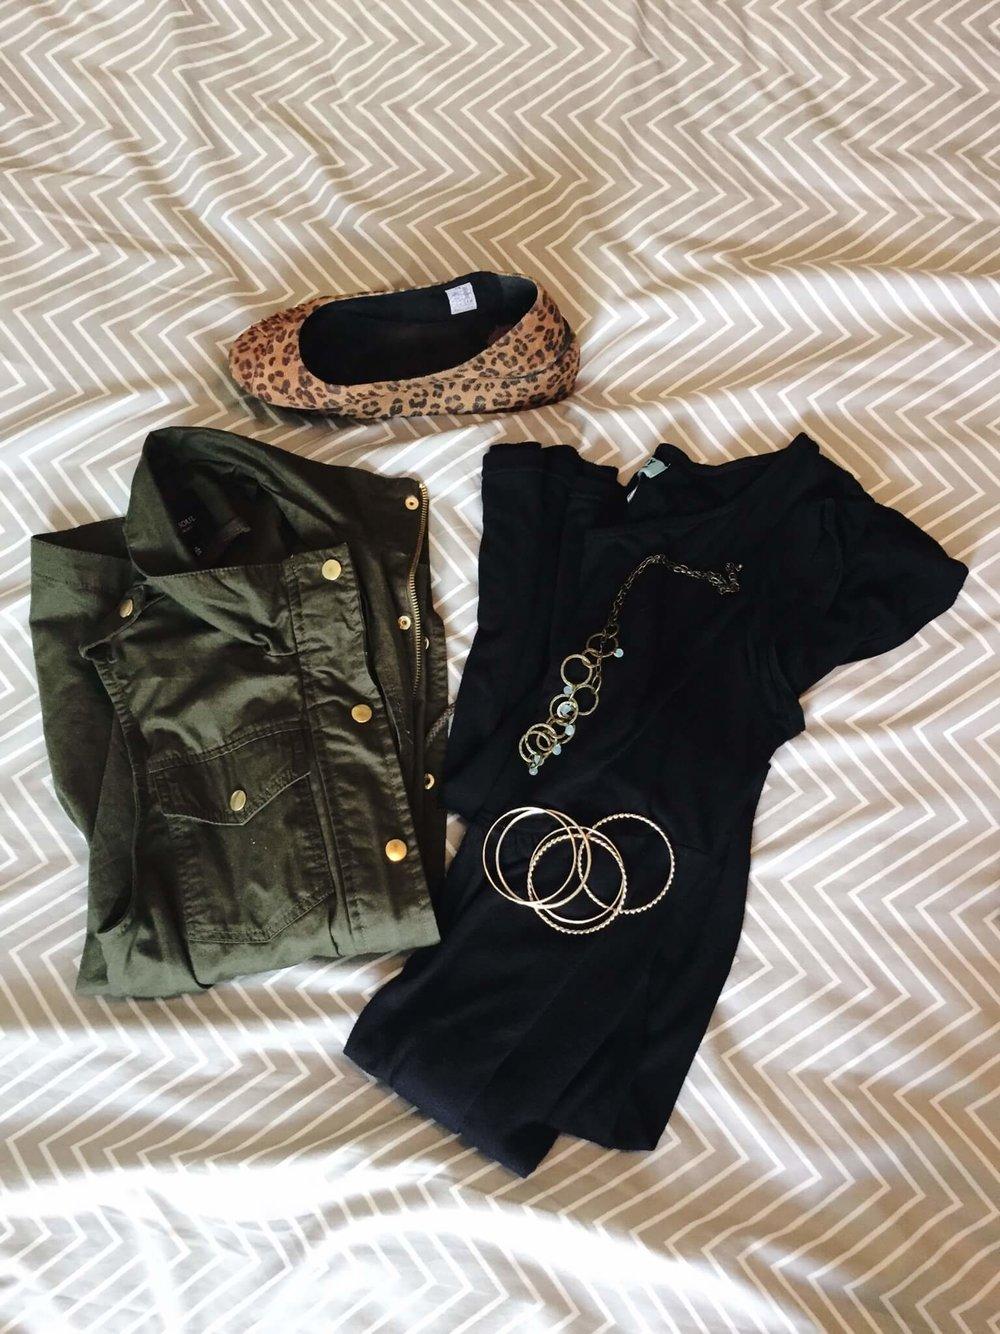 Dress + Utility Vest + Flats